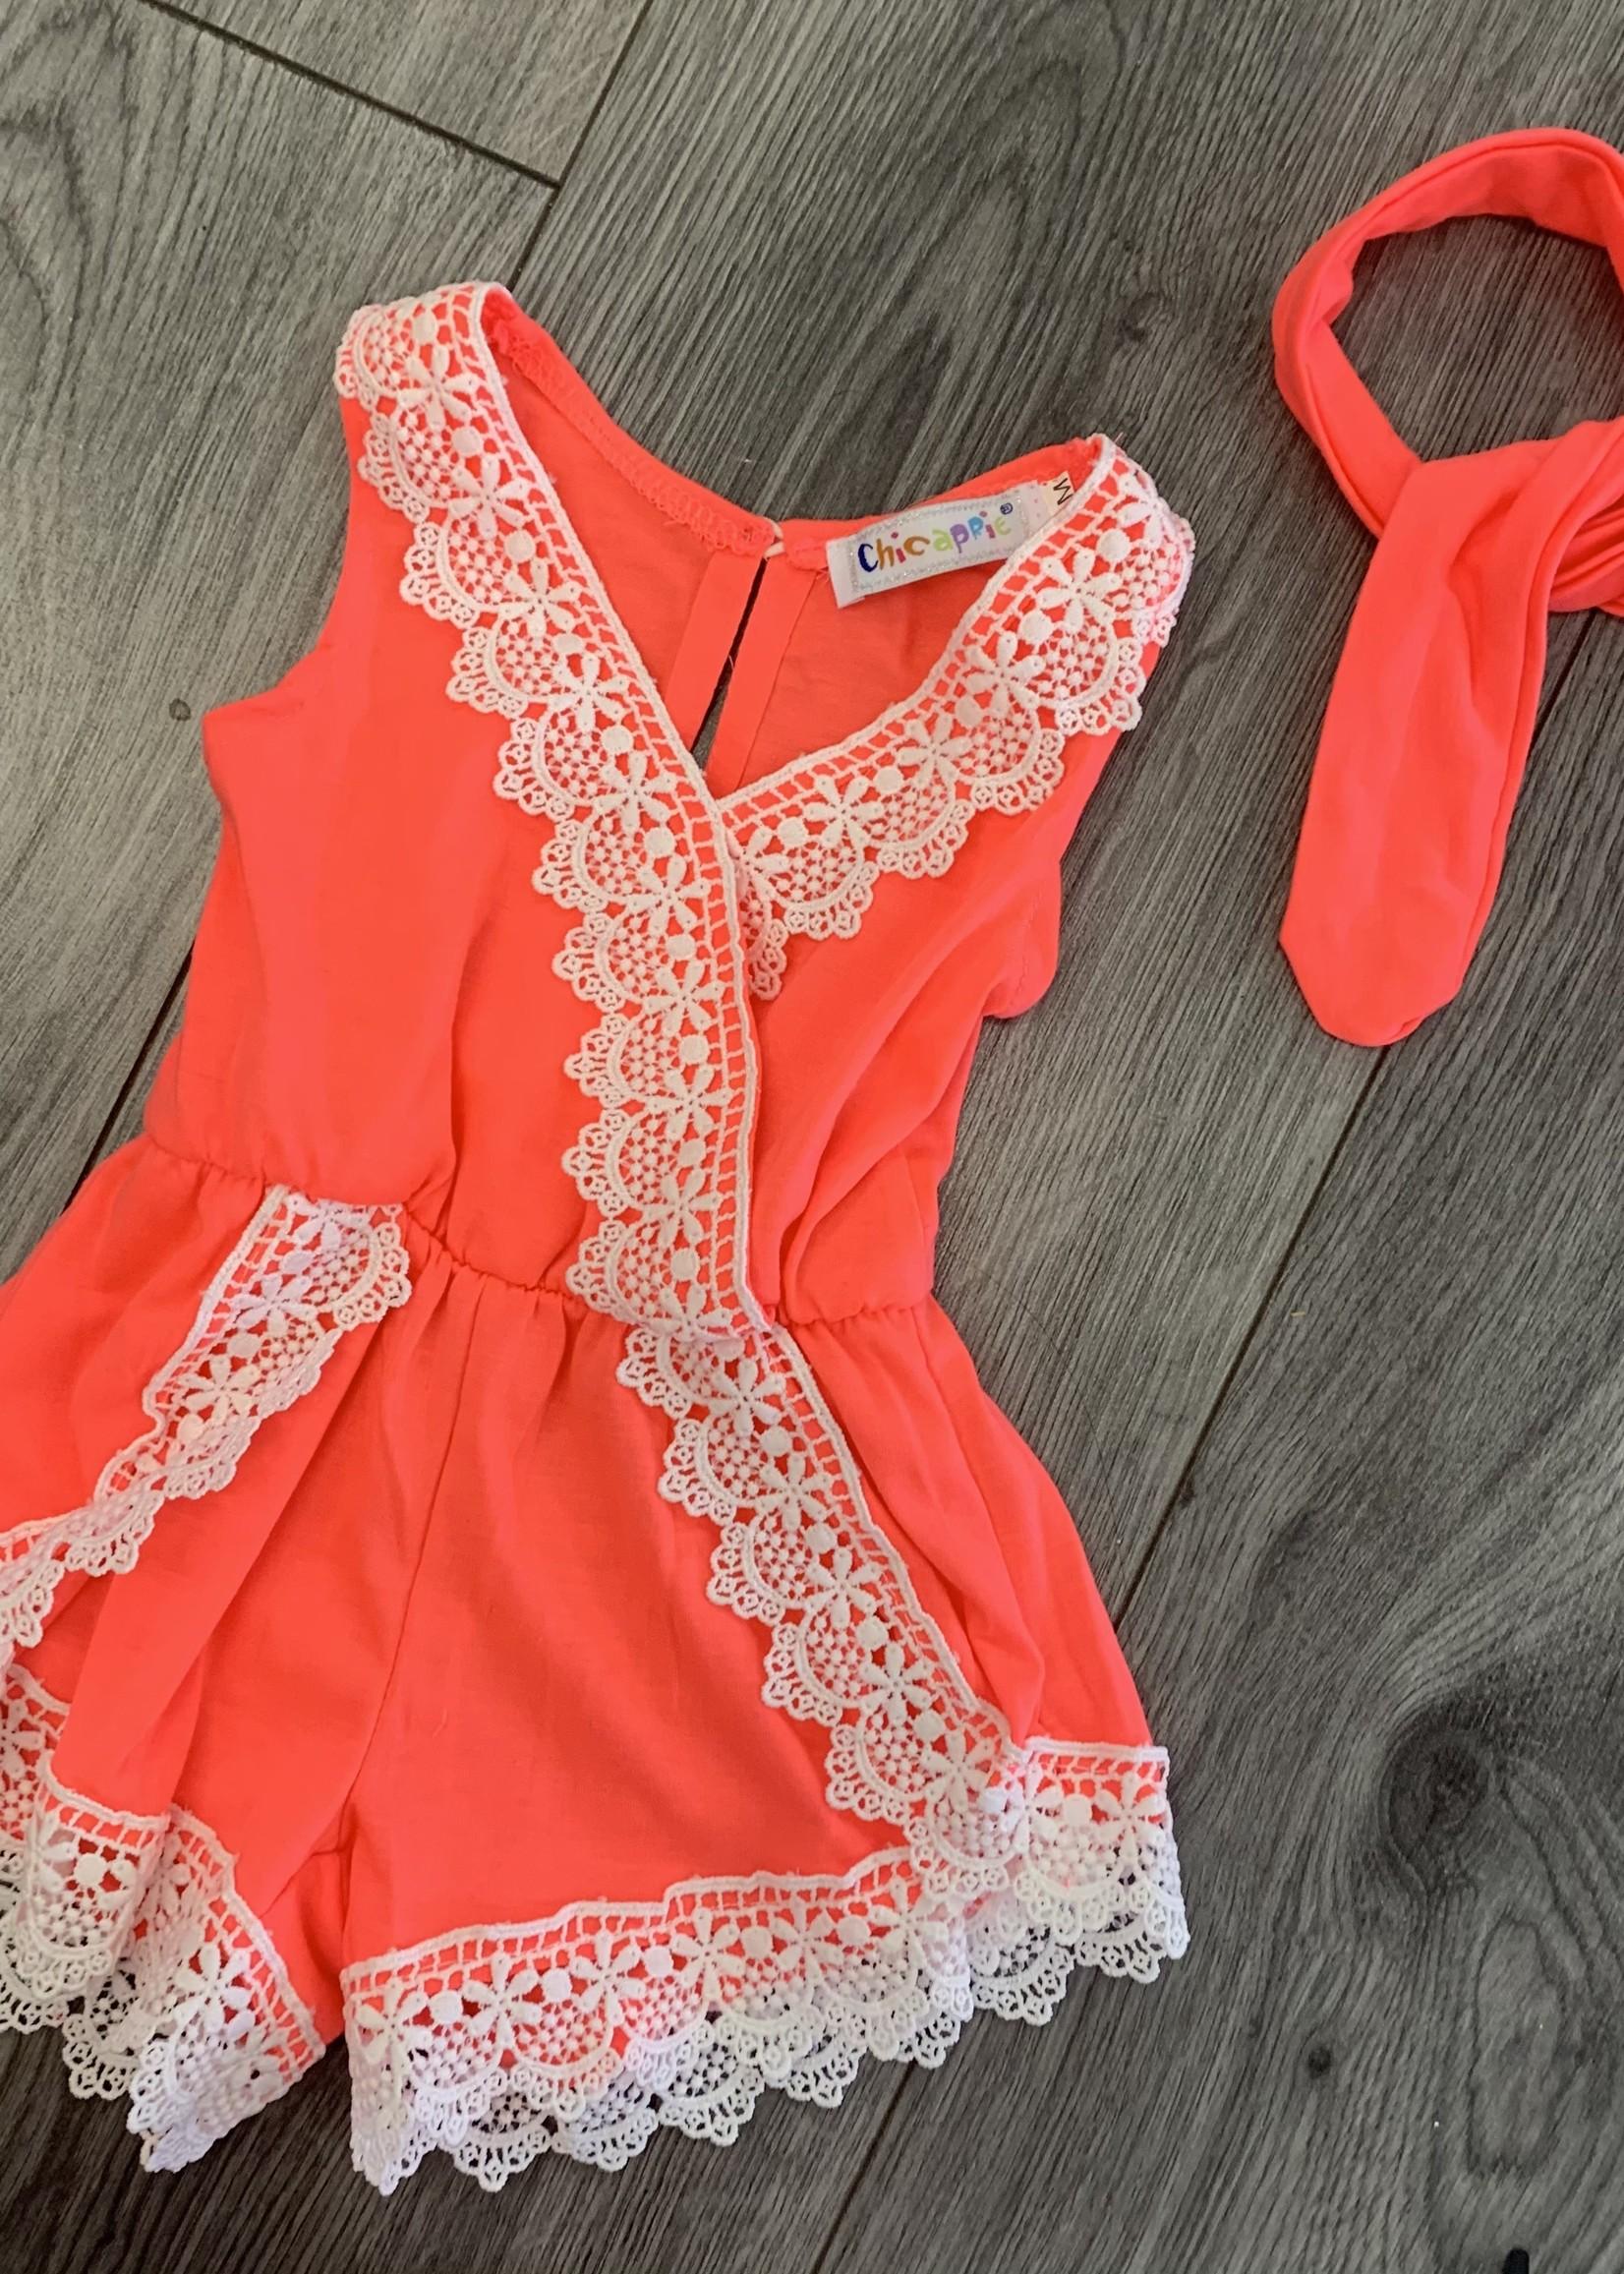 Divanis Divanis neon pink jumpsuit